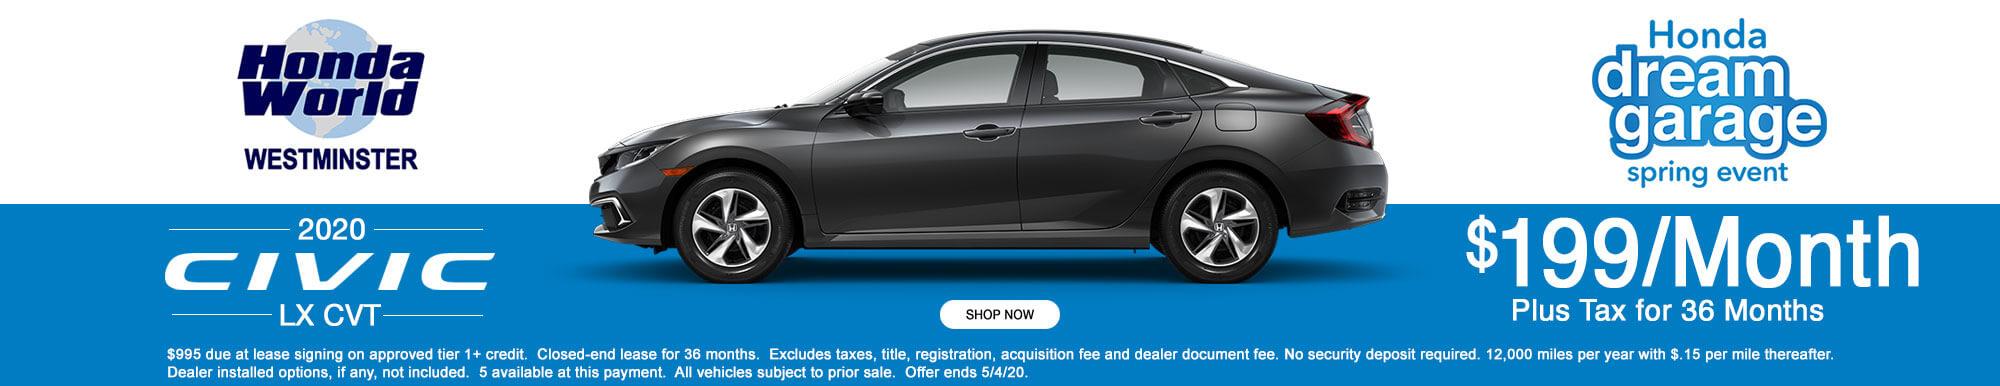 2020 Honda Civic LX Lease Offer